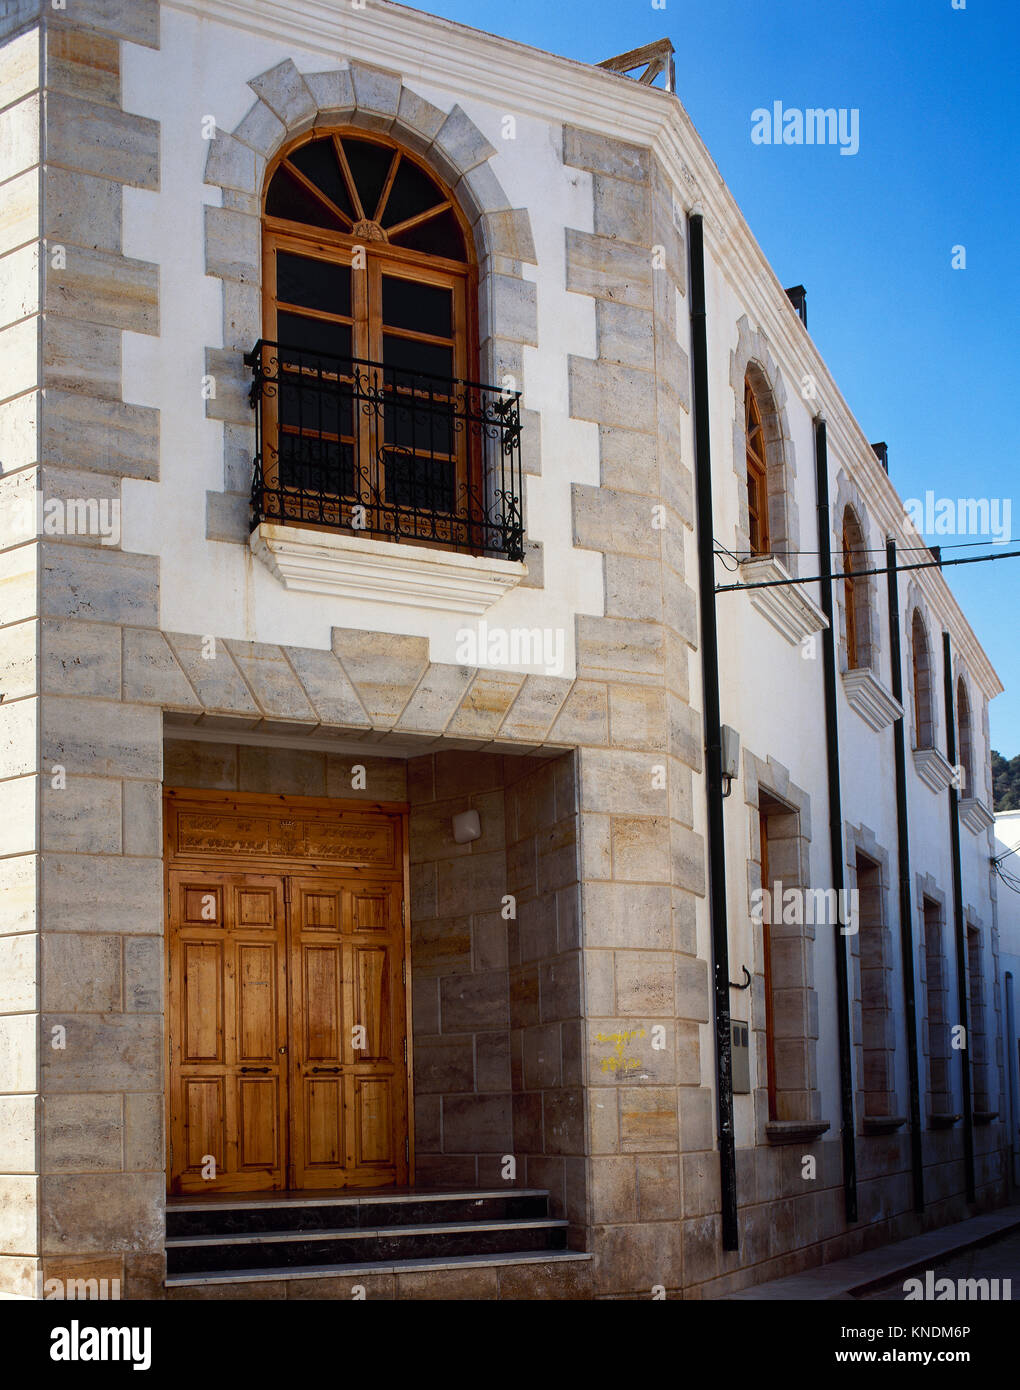 Nicolas Salmeron (1838-1908). Spanish politician. President of First Spanish Republic. Birthplace house. Alhama - Stock Image